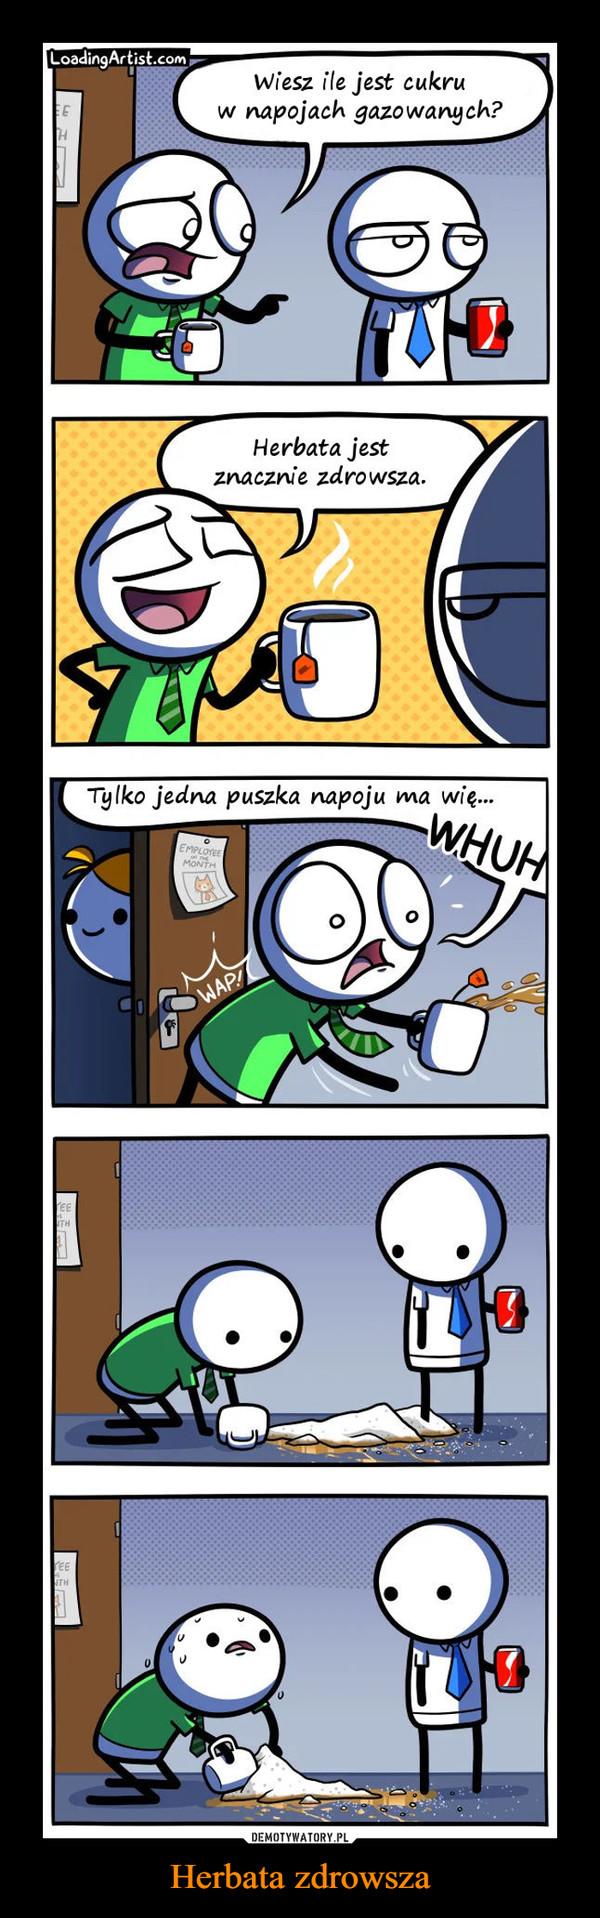 Herbata zdrowsza